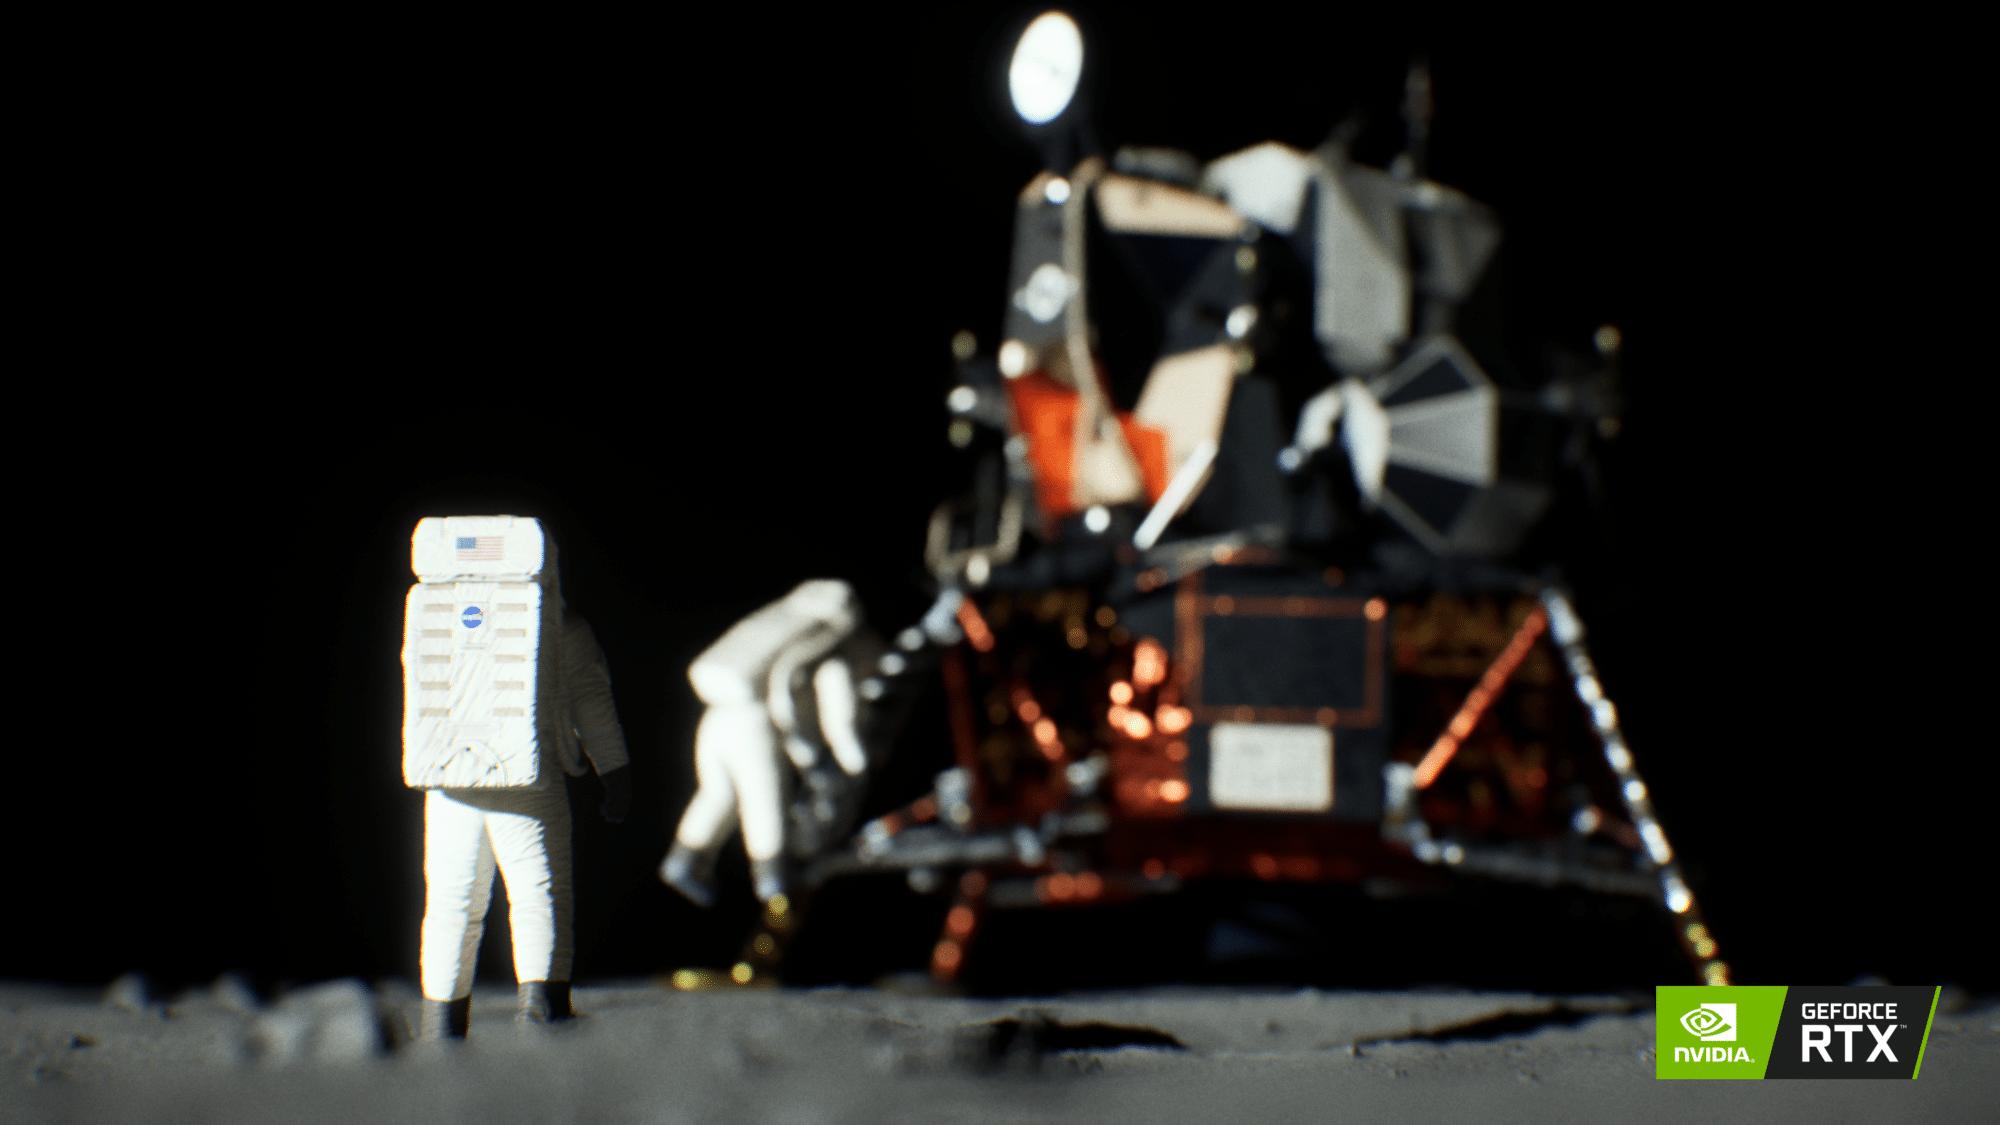 Turing Recreates Scene of Iconic Lunar Landing | NVIDIA Blog